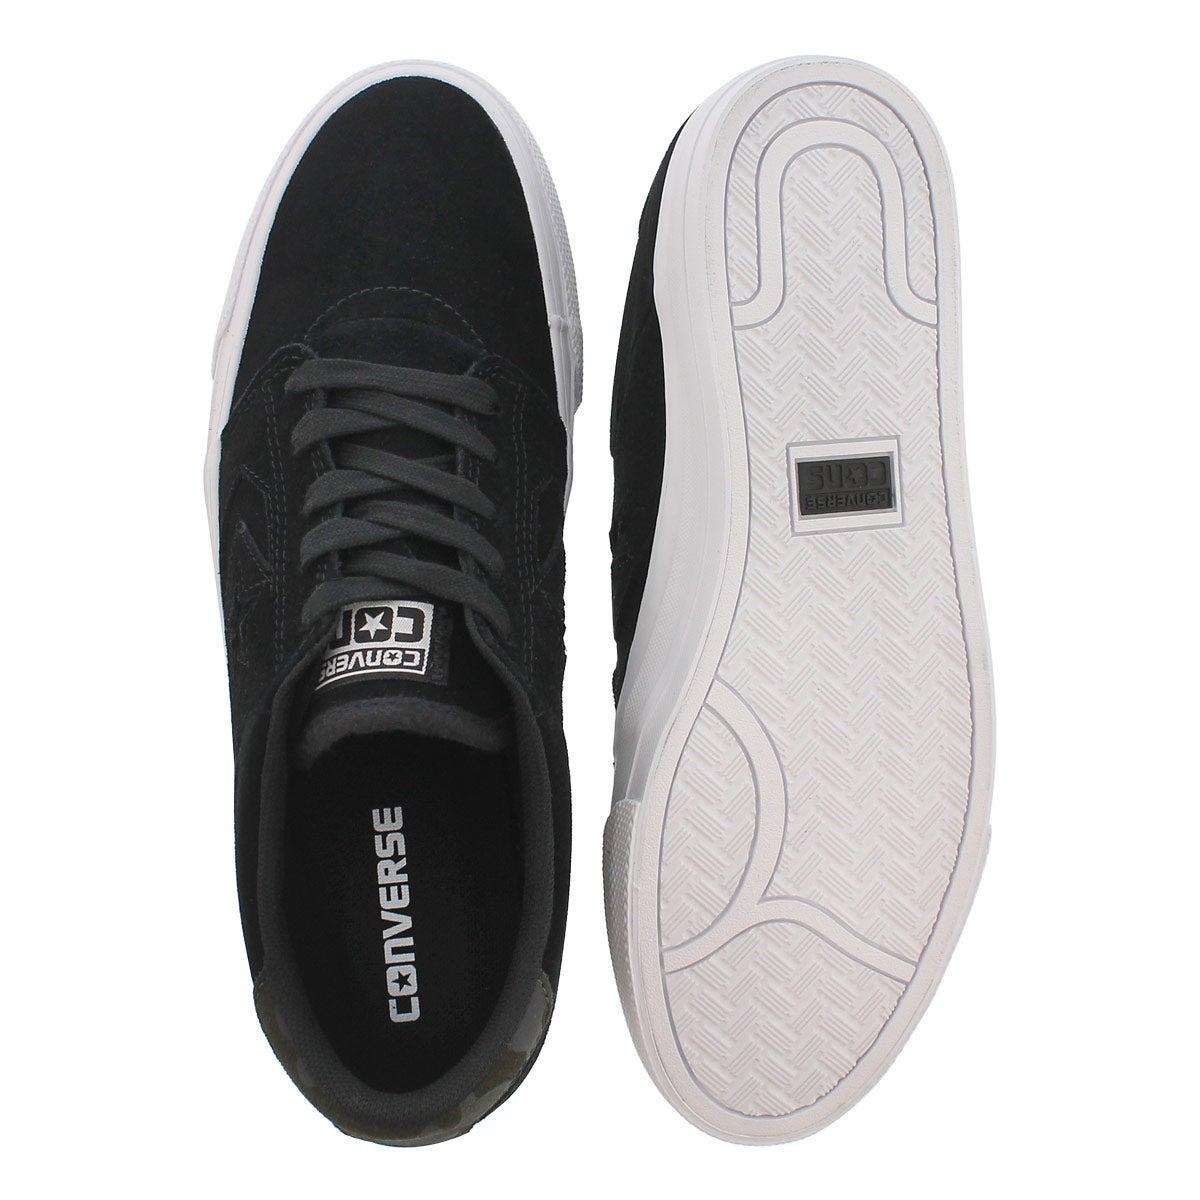 Mns CT A/S Tre Star black sneaker